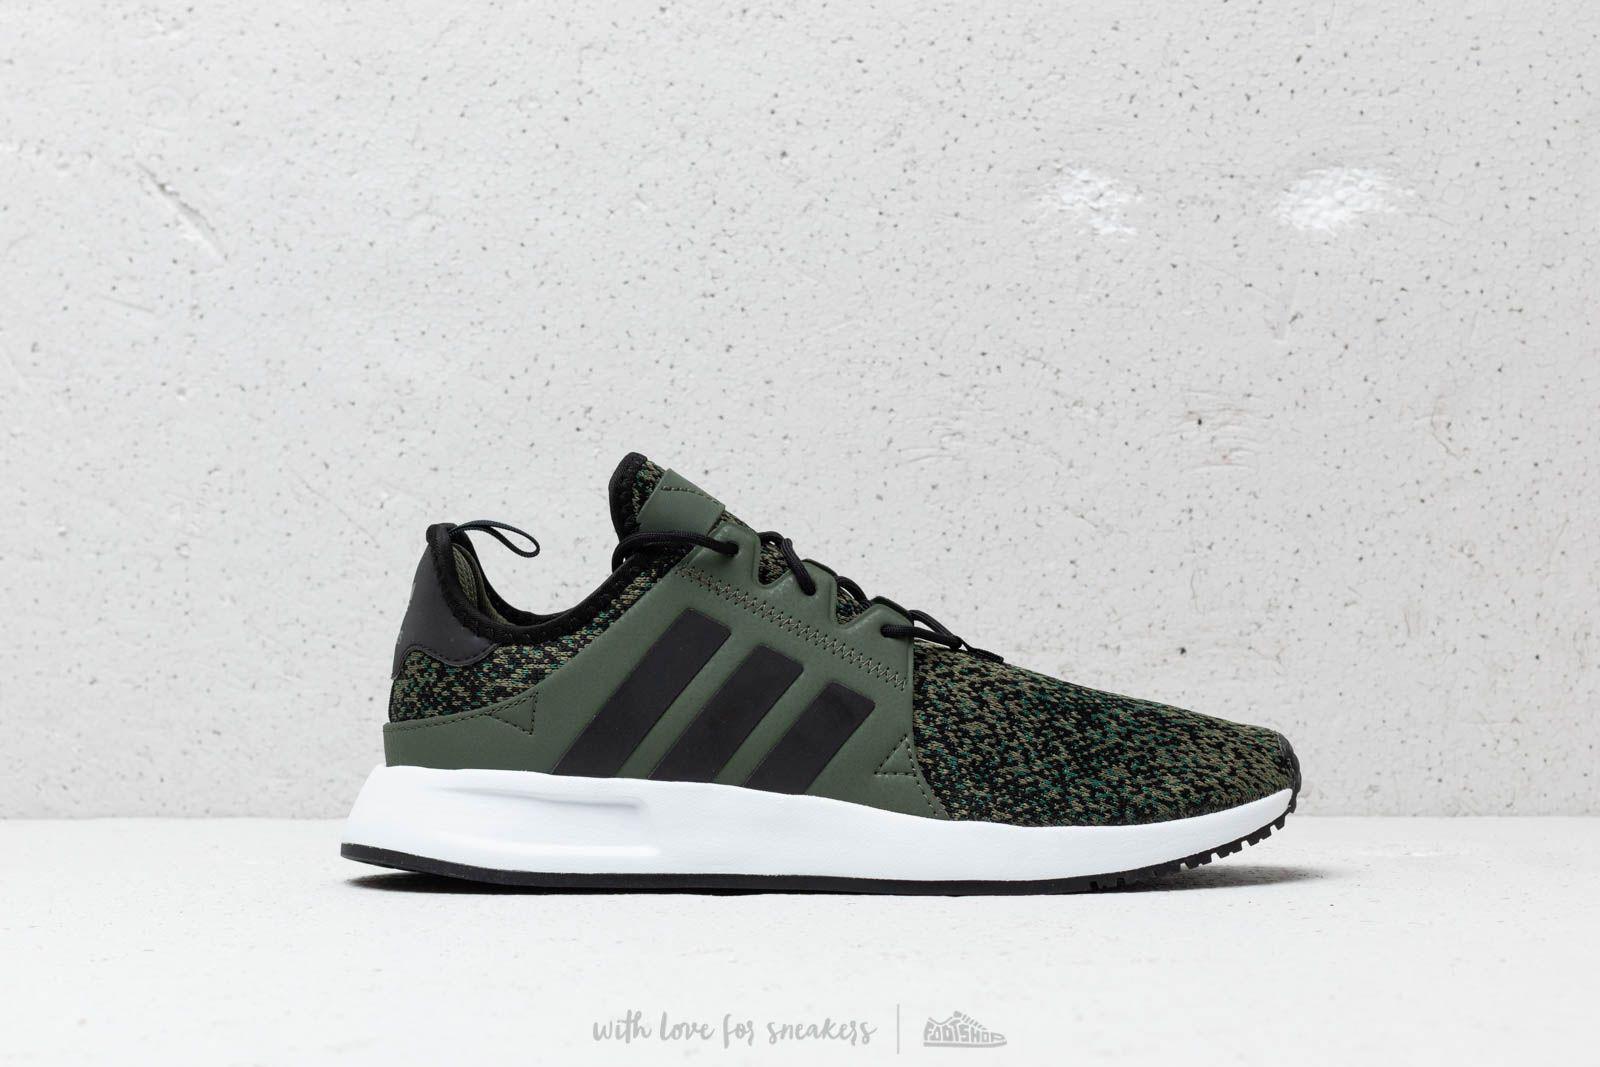 Adidas Originals - Adidas X plr Base Green  Core Black  Ftwr White for Men  -. View fullscreen 4898f5a6c